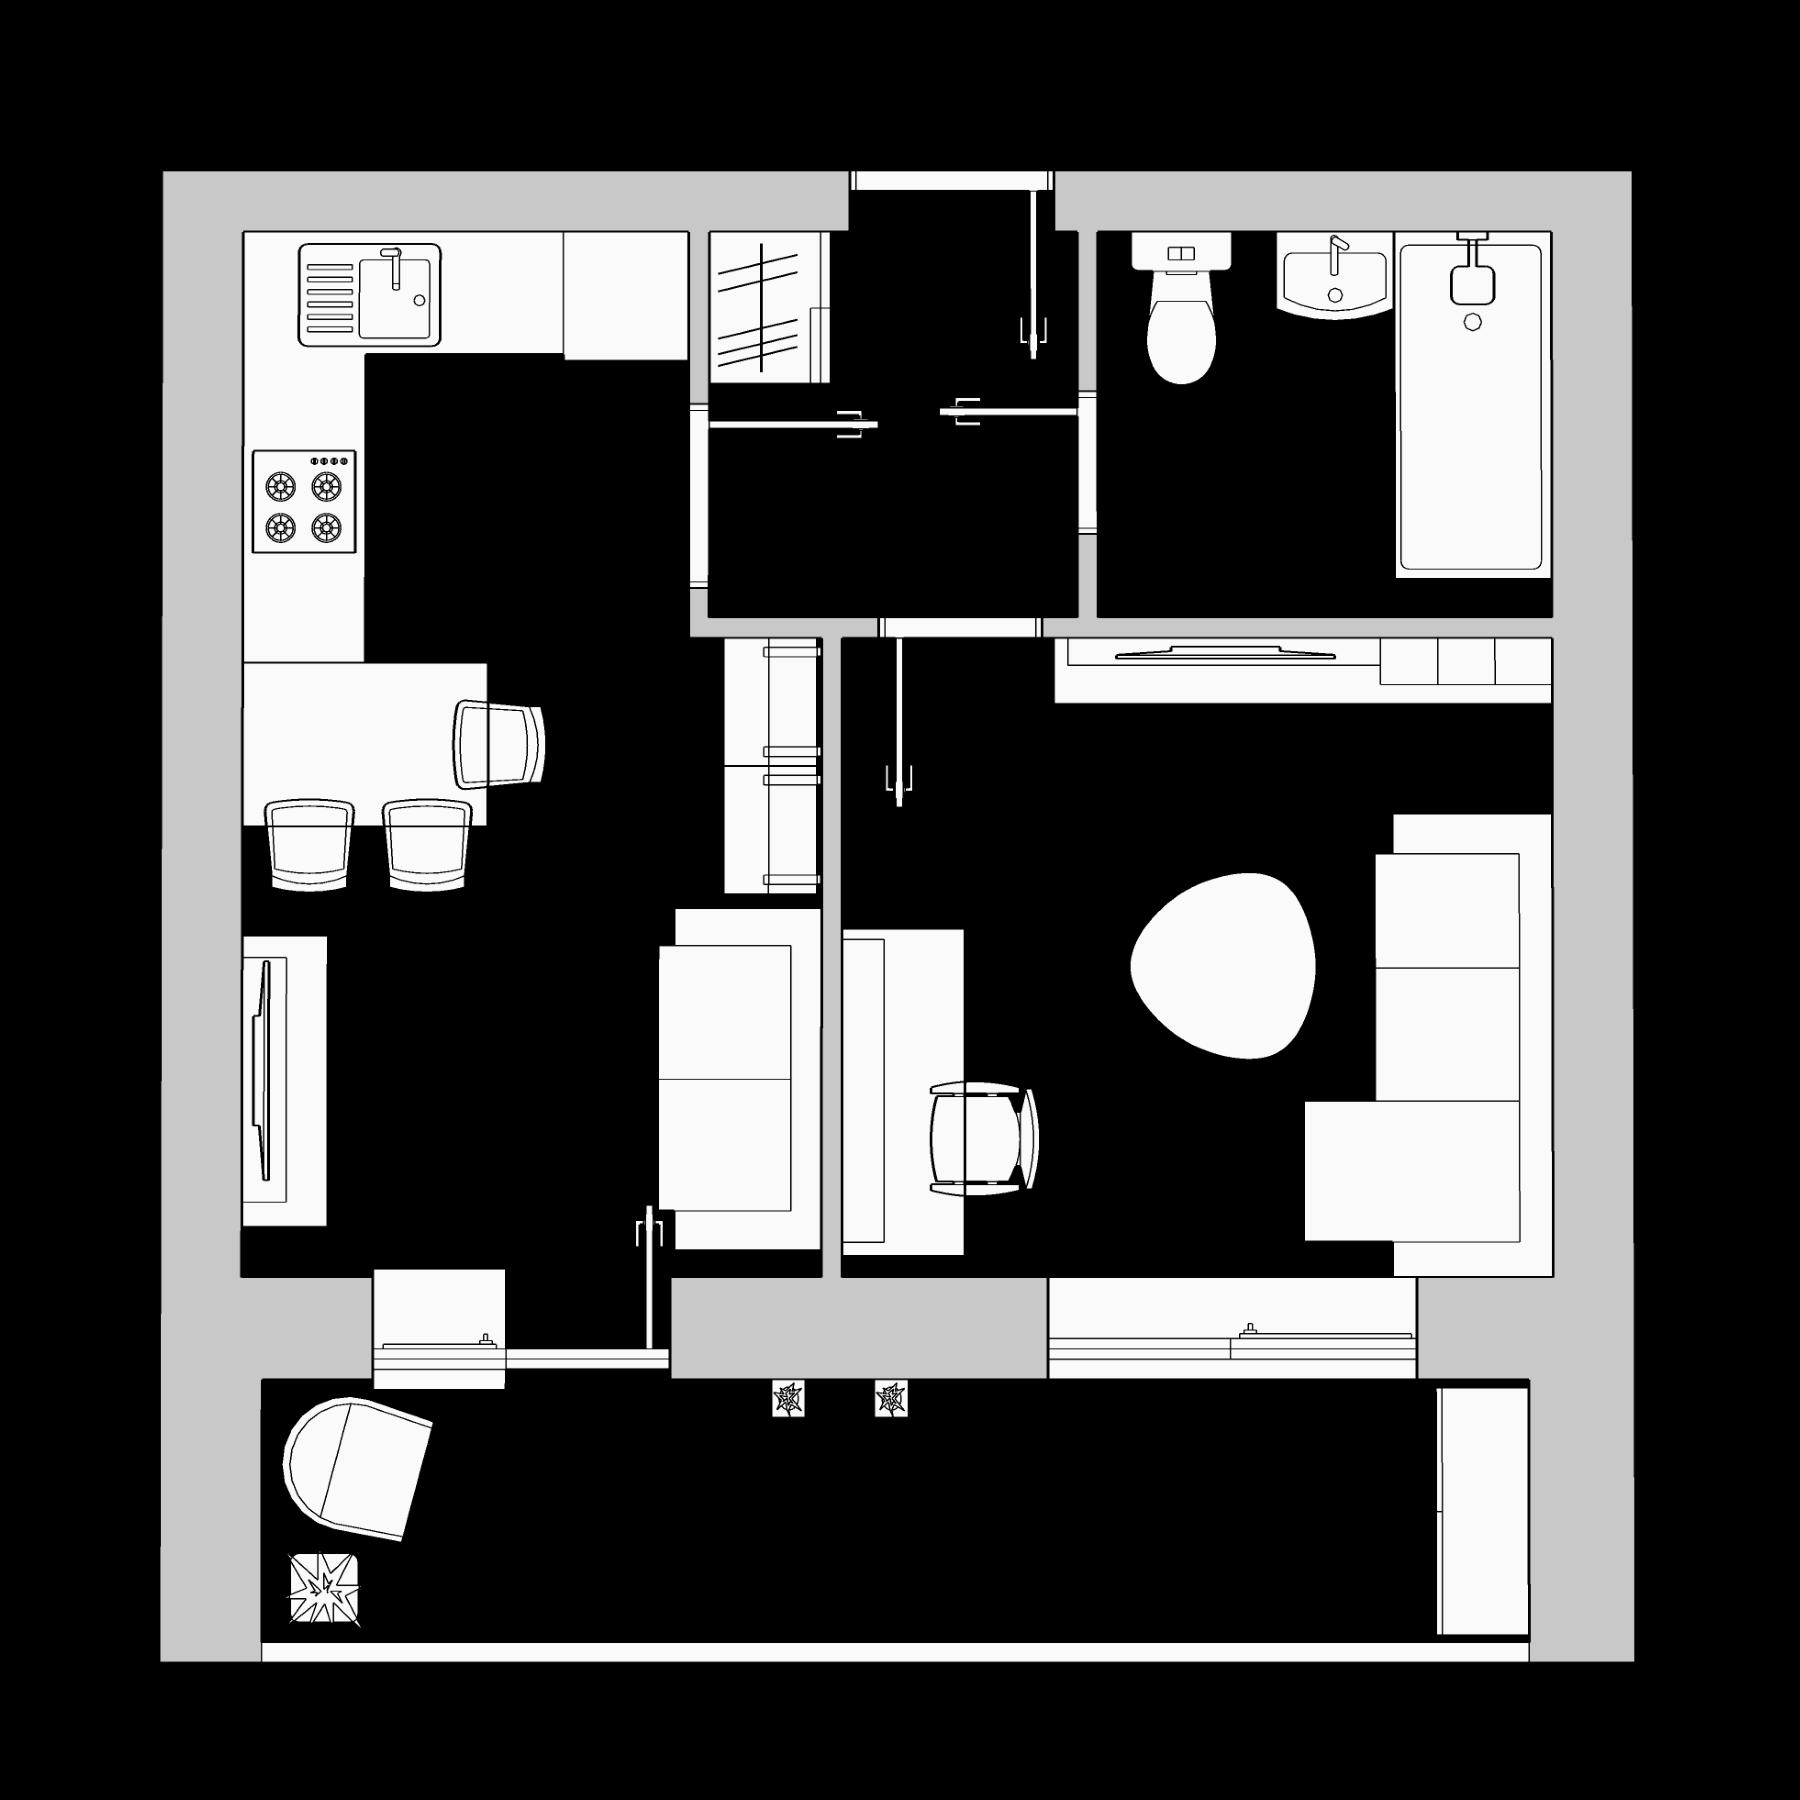 Однокомнатная квартира 35.54